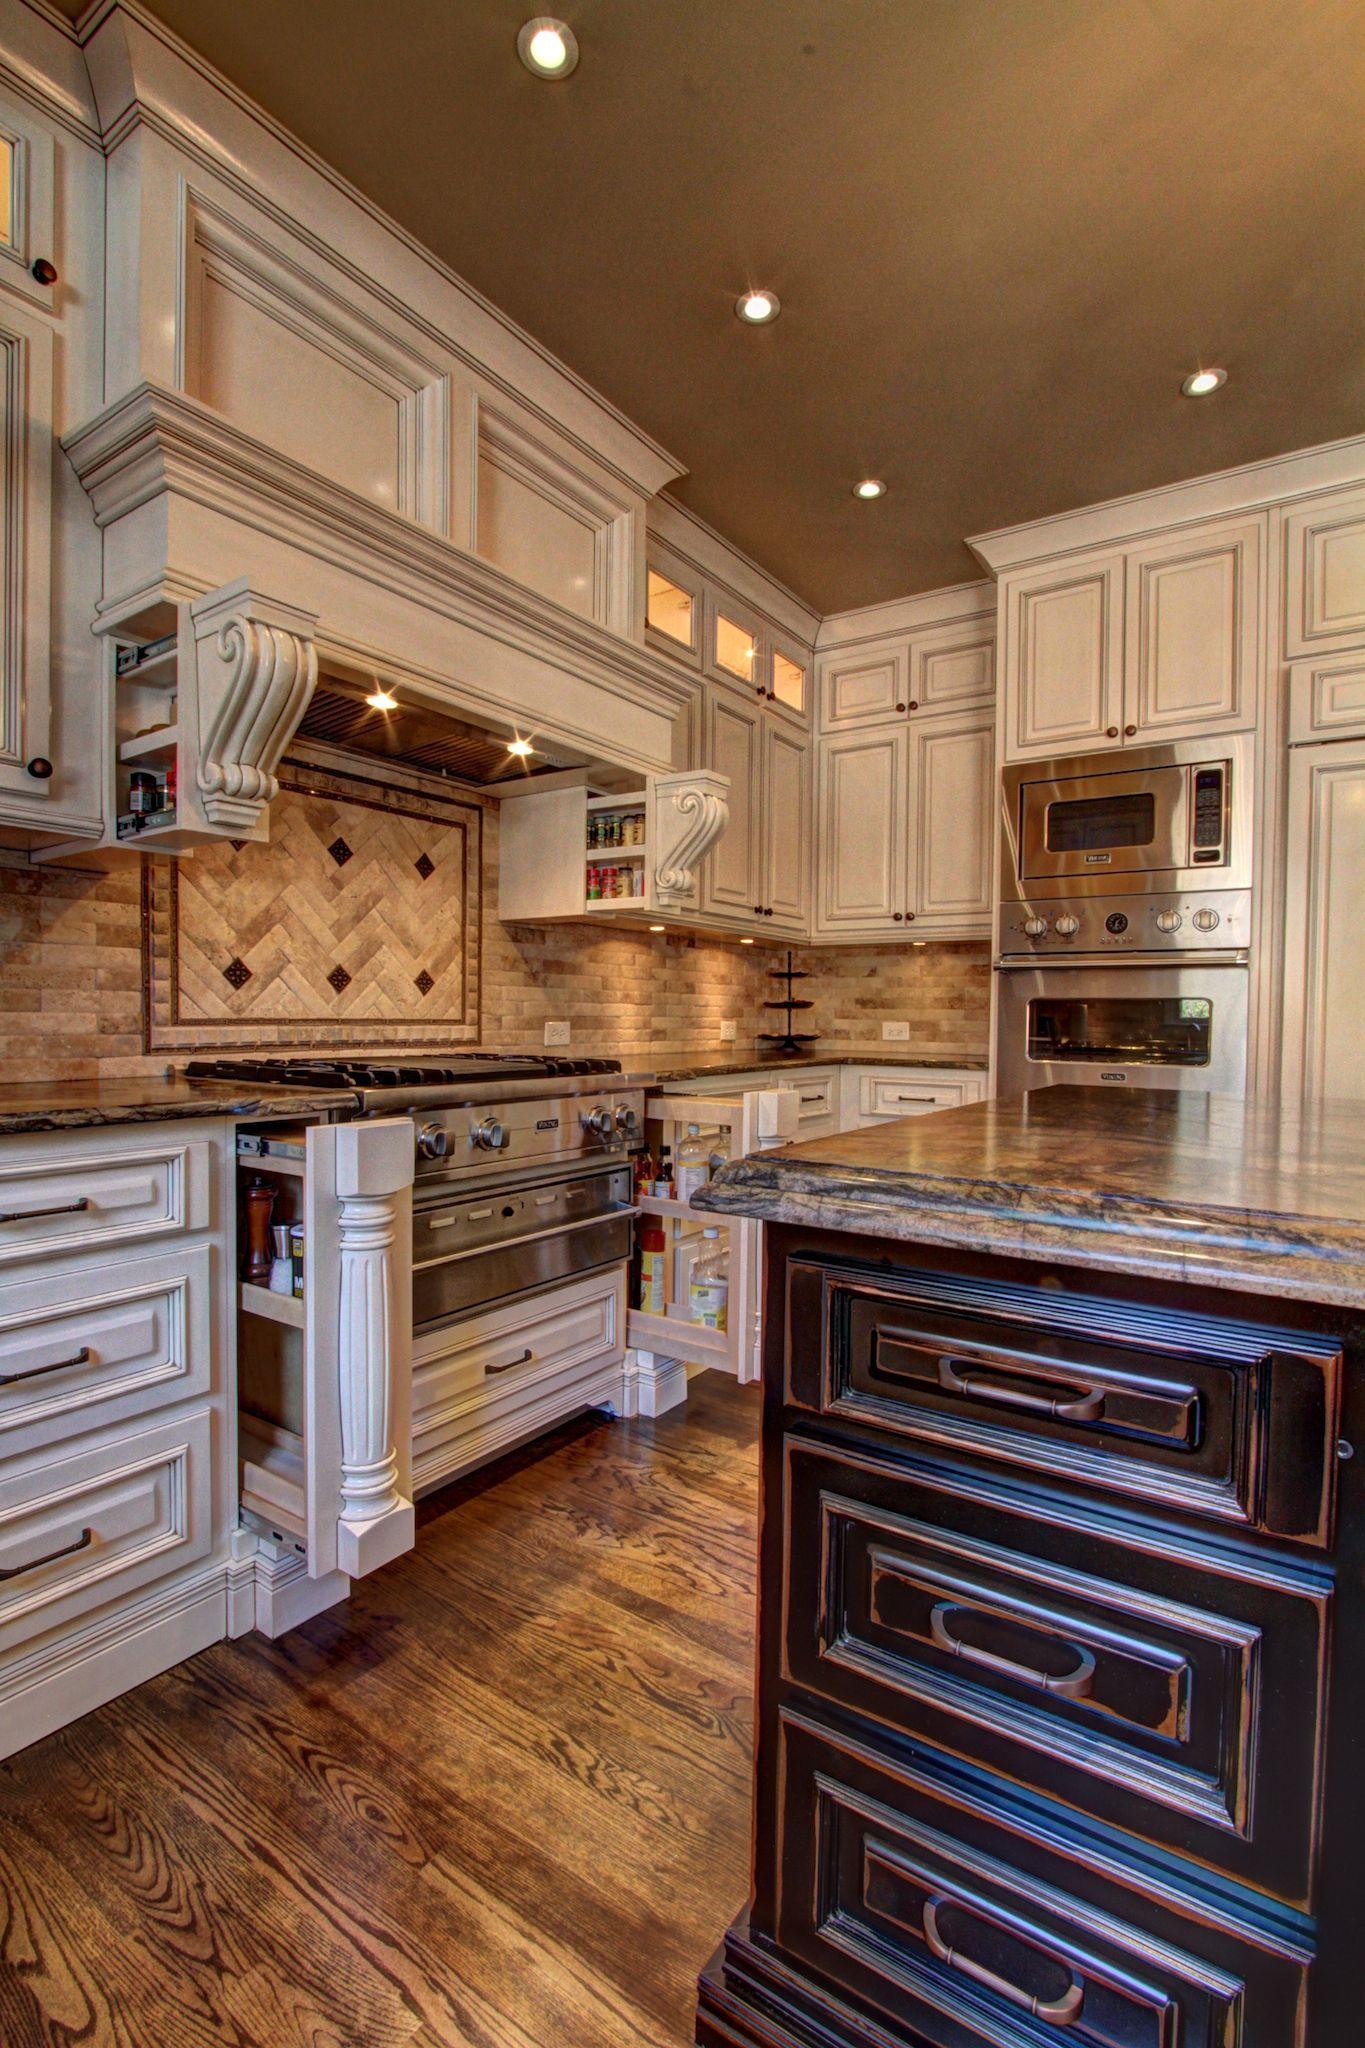 Hidden Spice Rack Traditional Kitchen Online Kitchen Cabinets Traditional Kitchen Cabinets